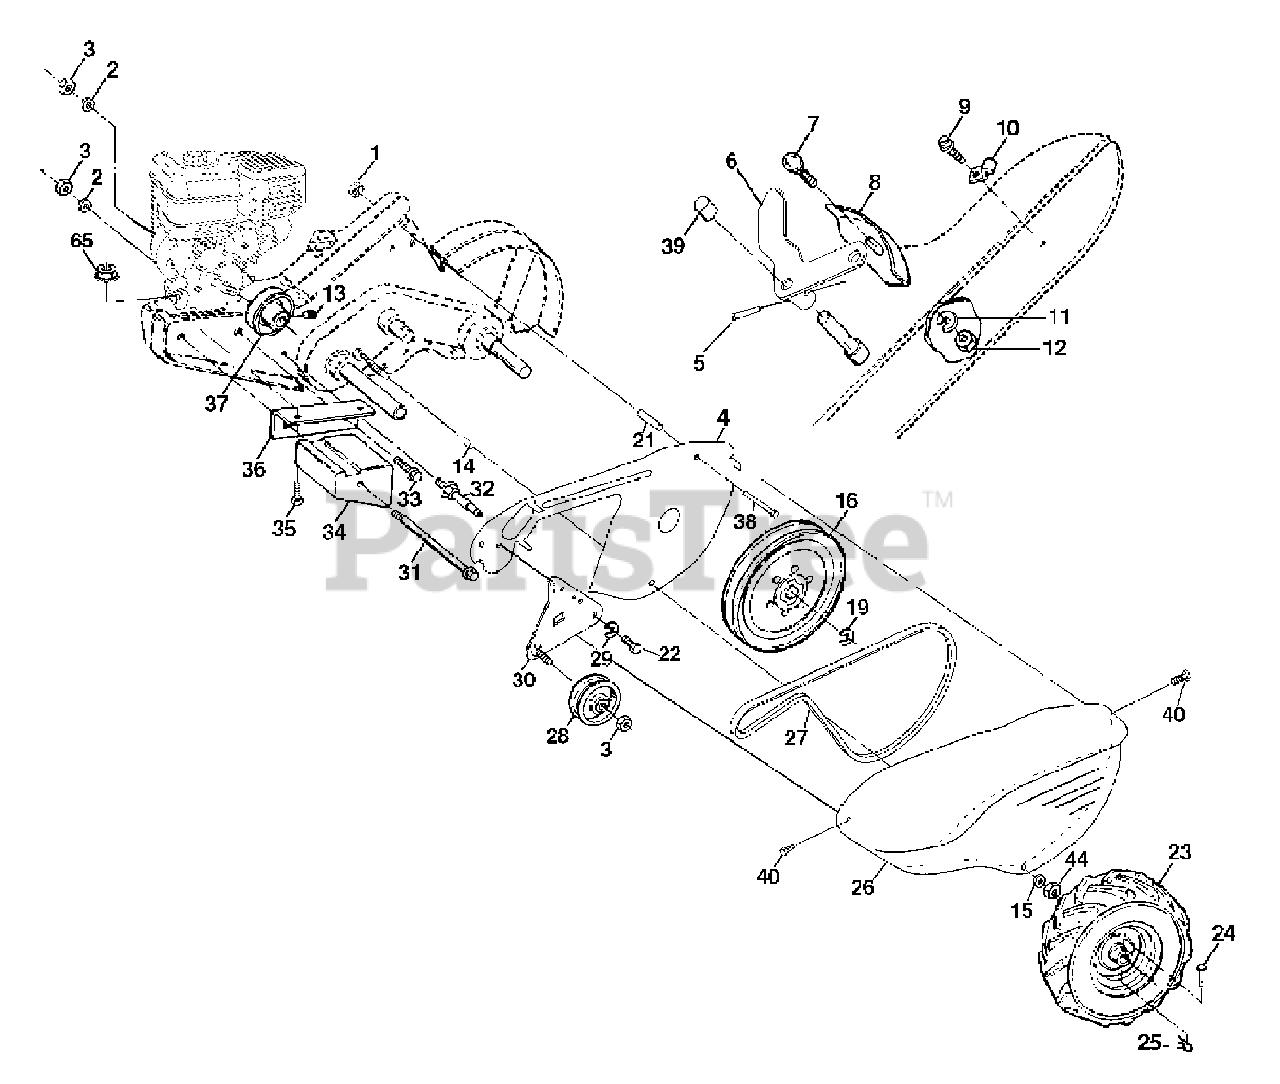 Craftsman Parts on the Mainframe, Left Side Diagram for